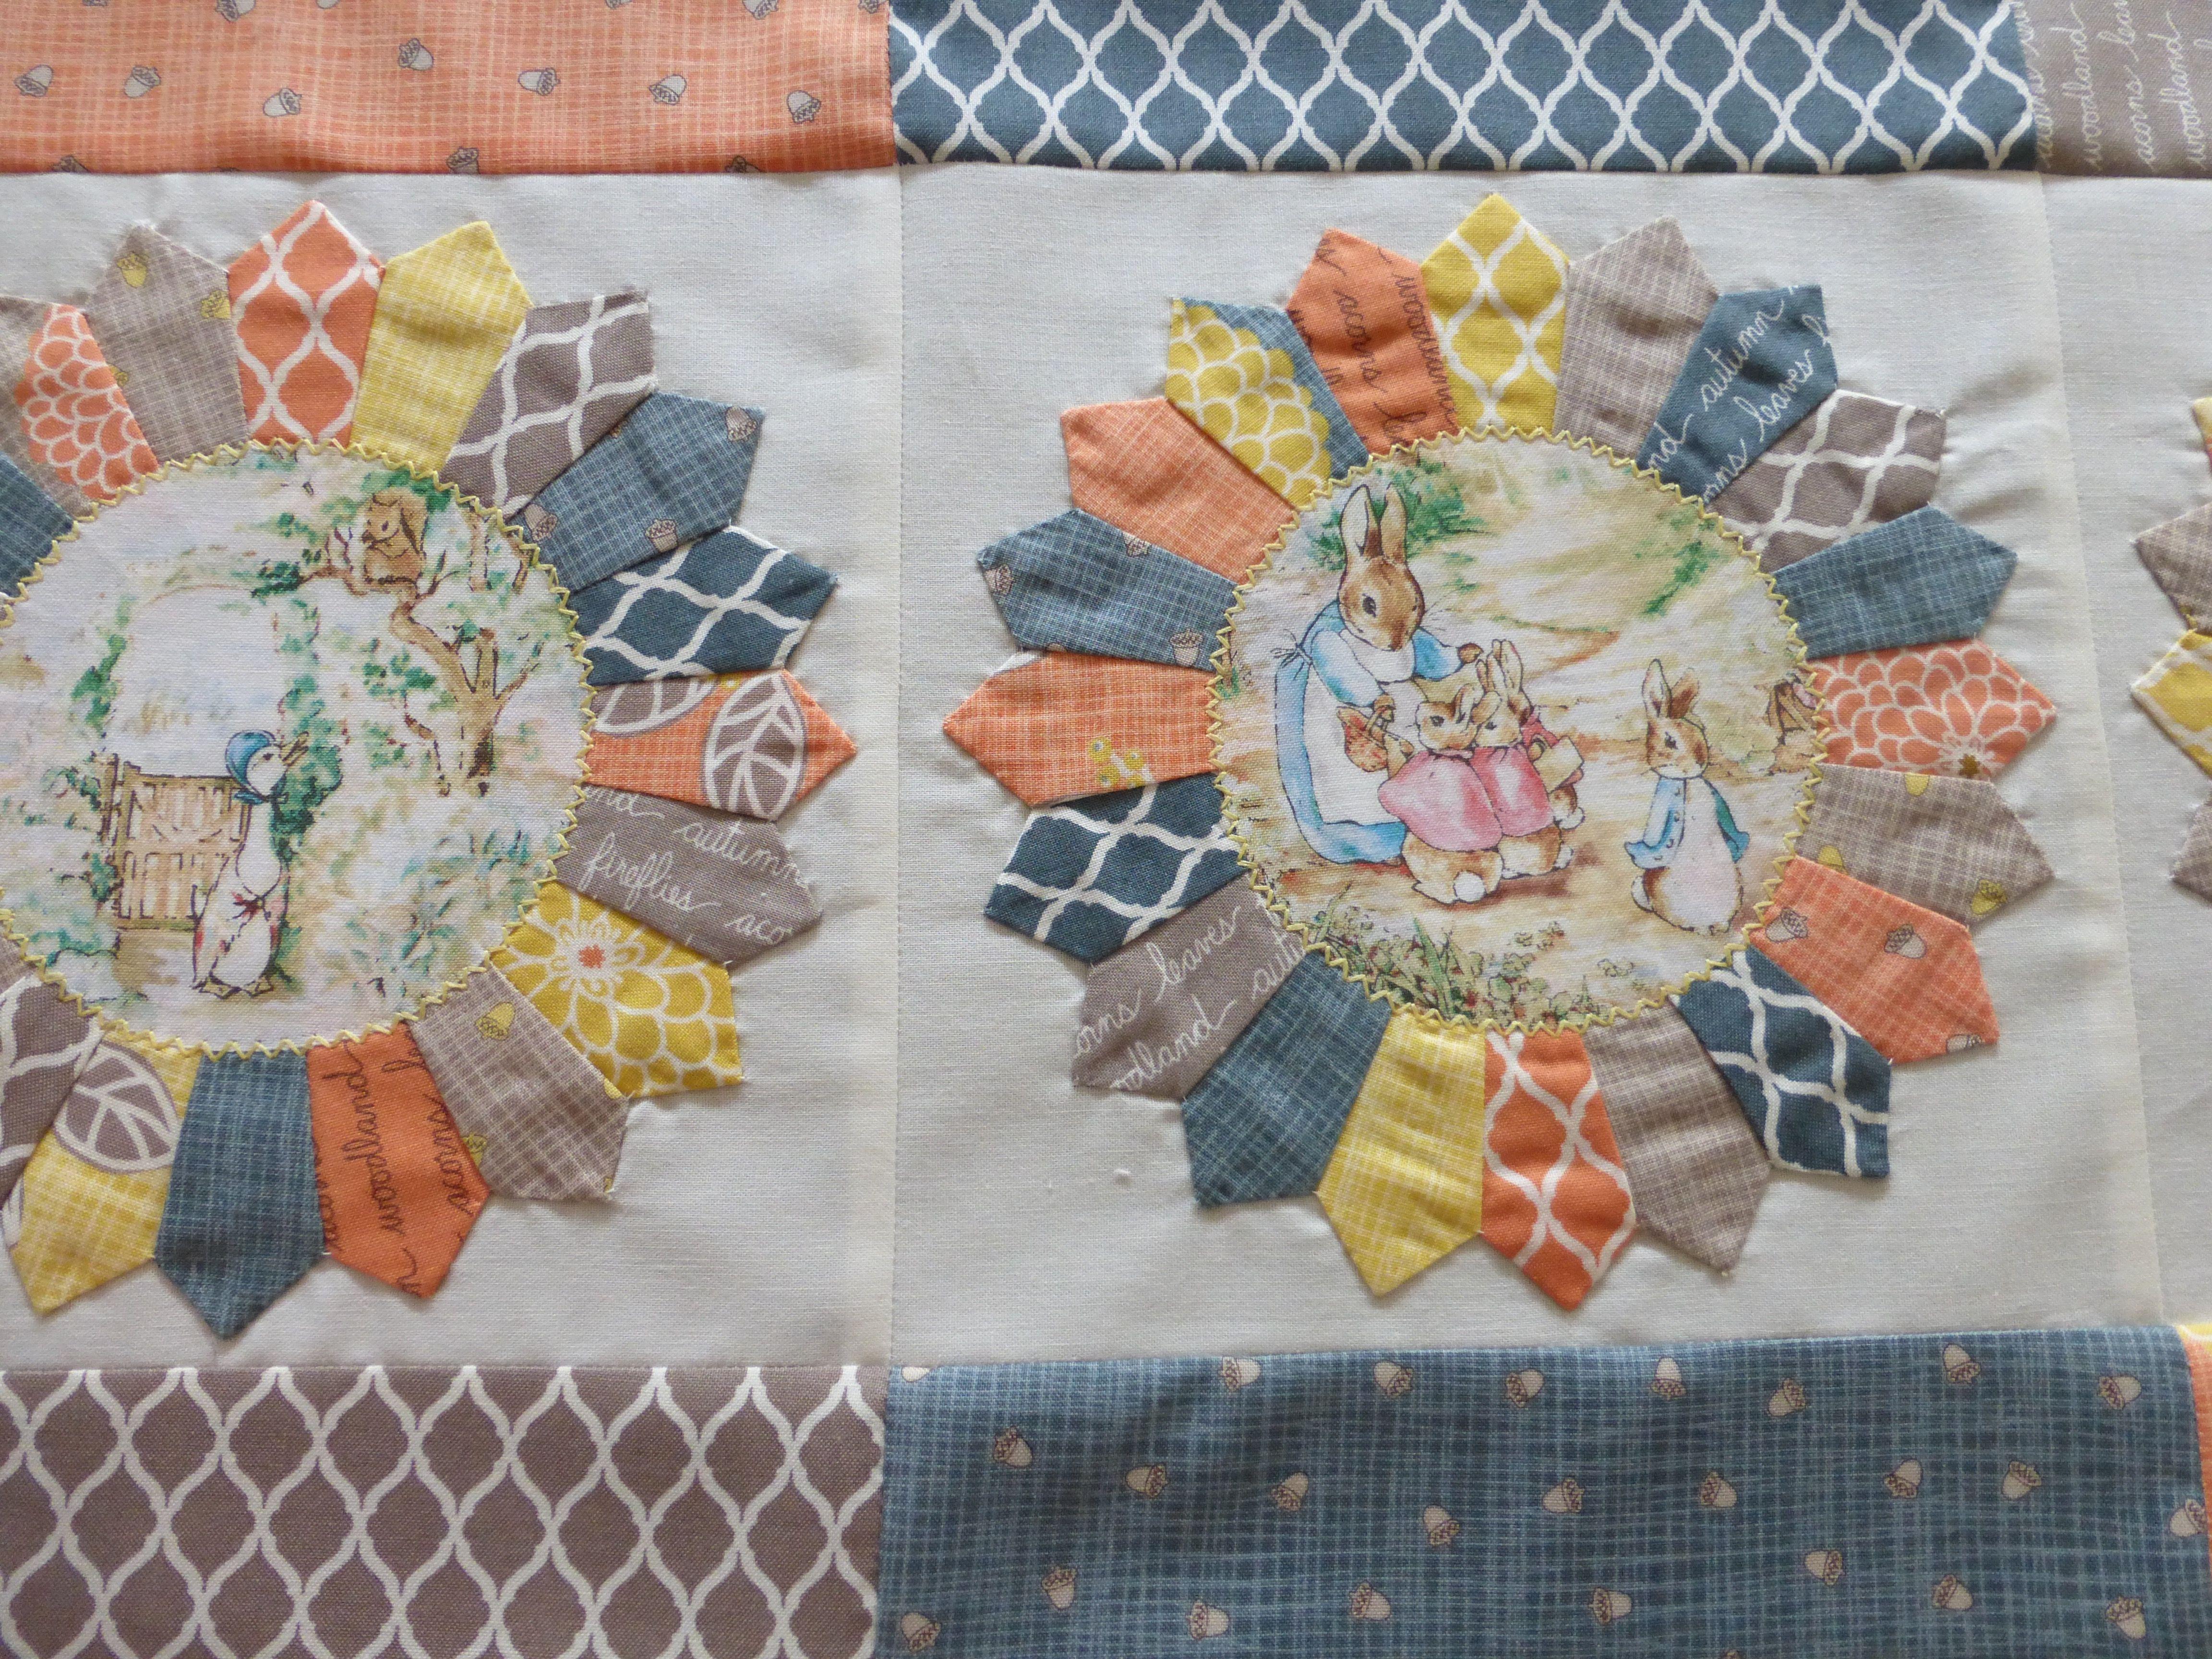 Dresden plates on Adri's quilt